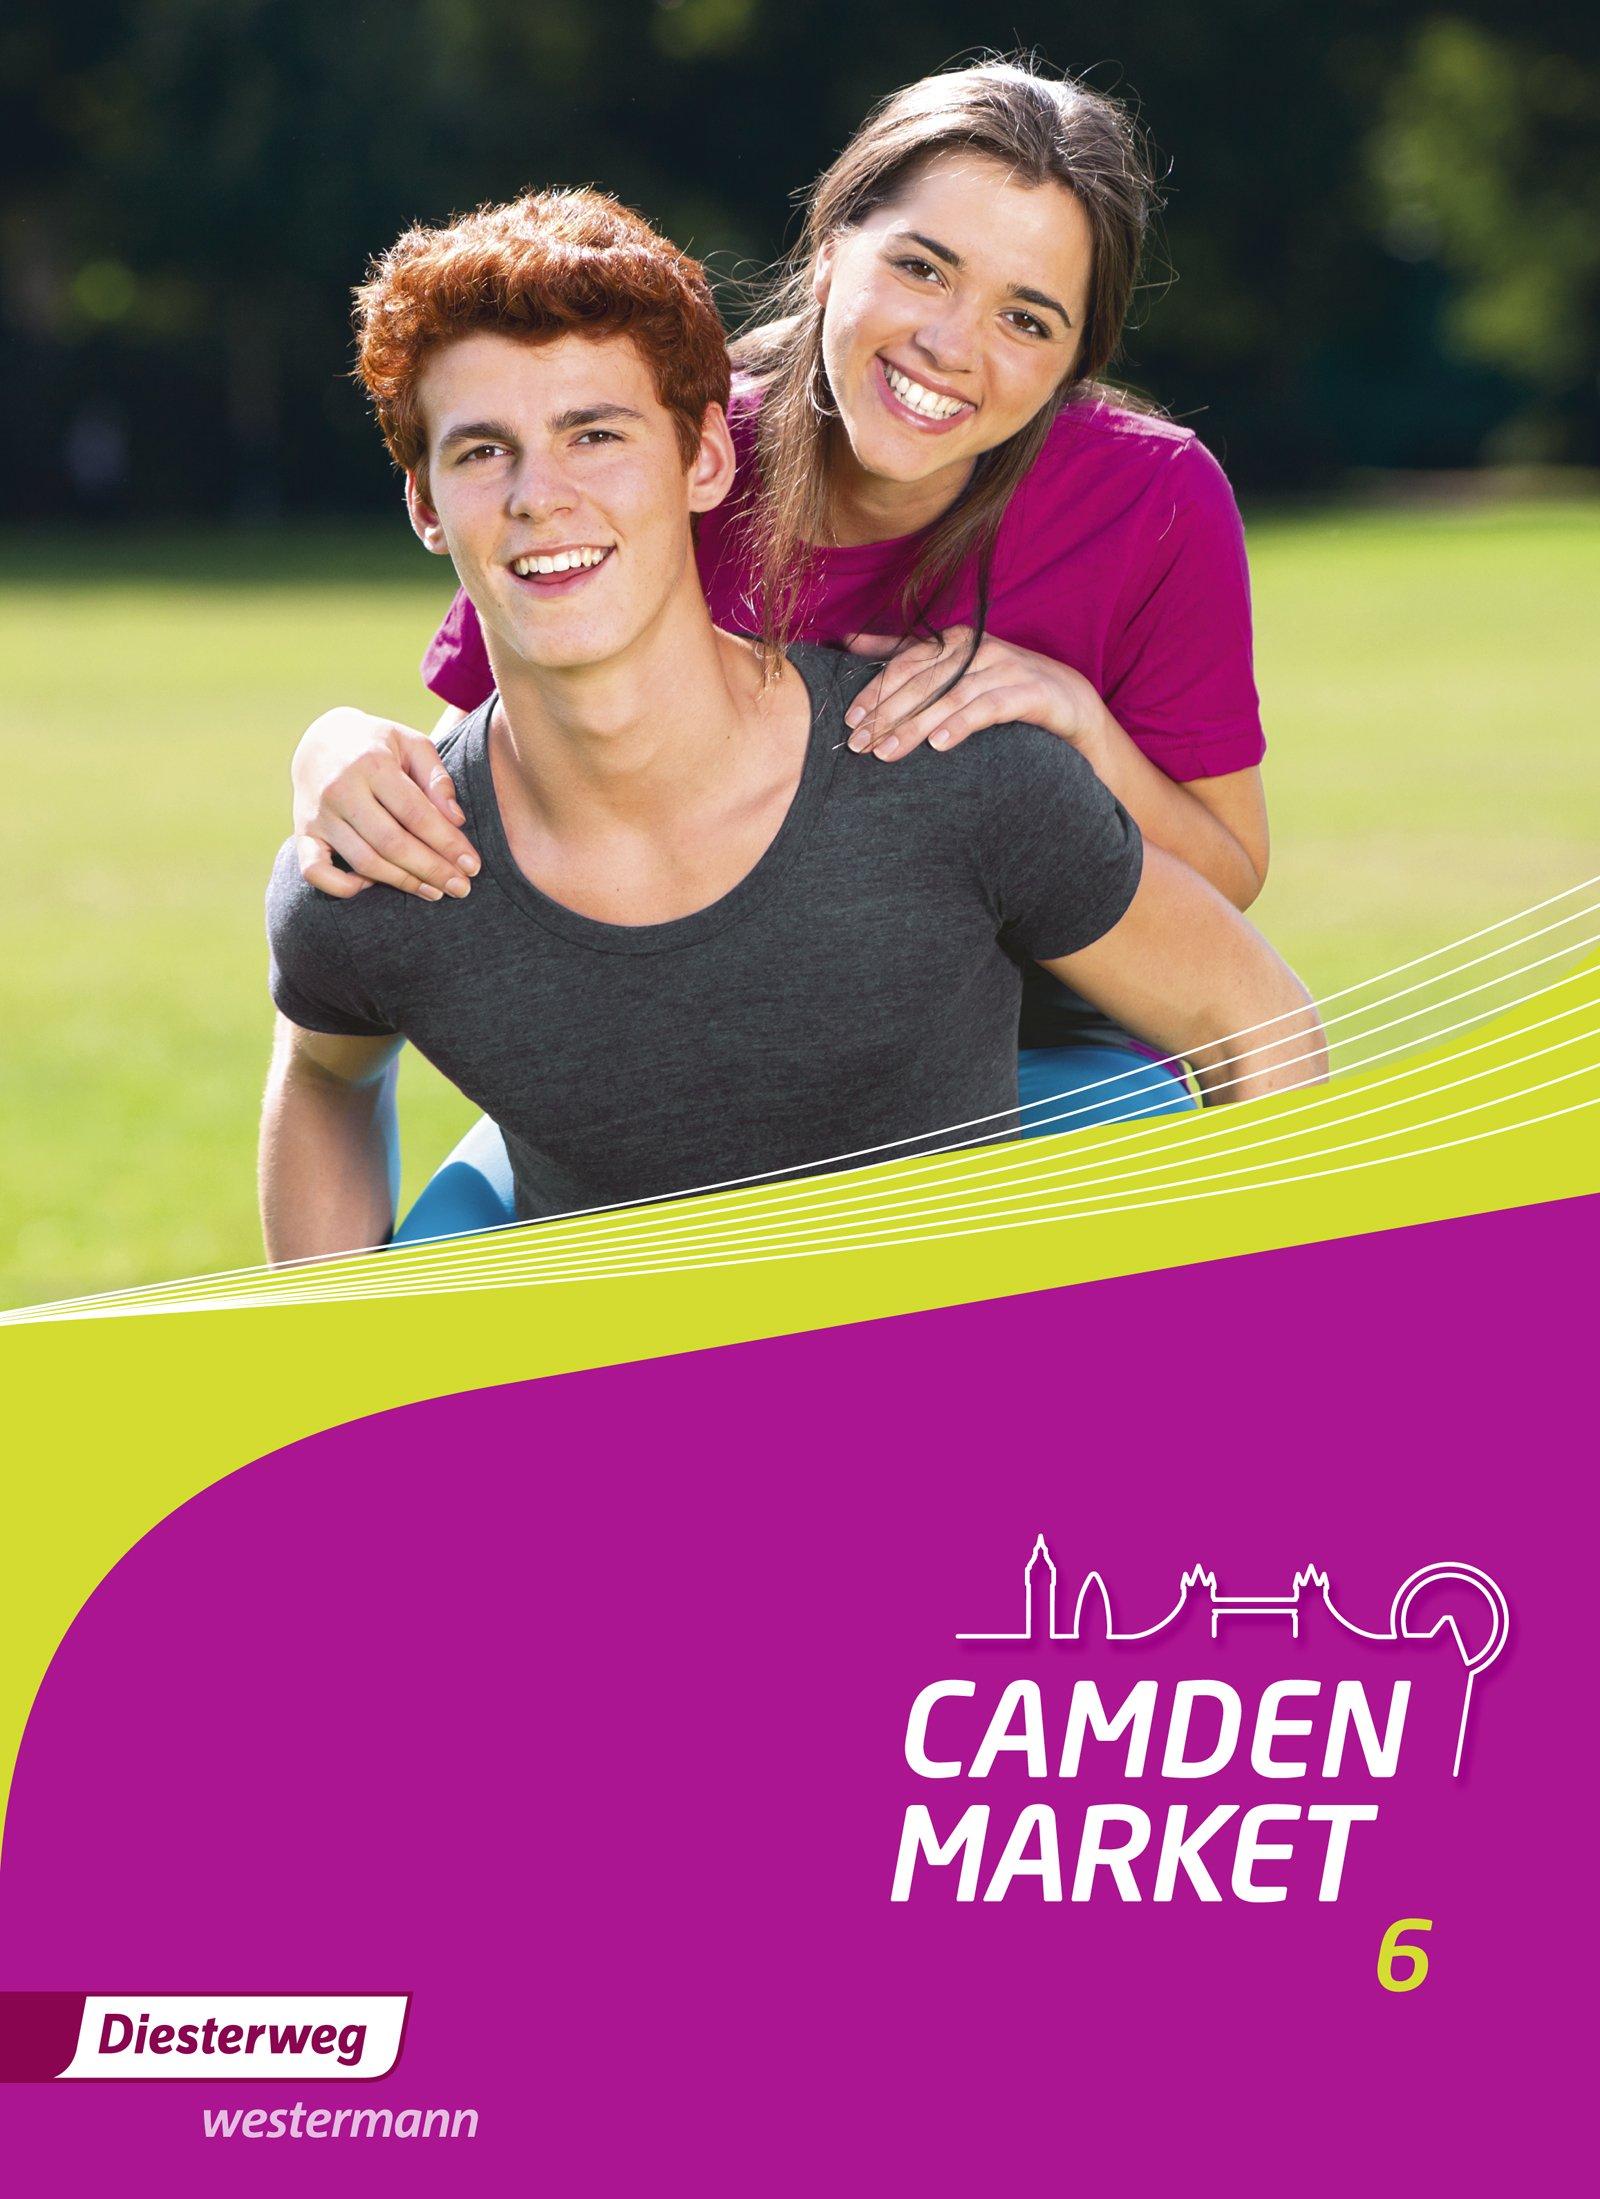 camden-market-ausgabe-2013-textbook-6